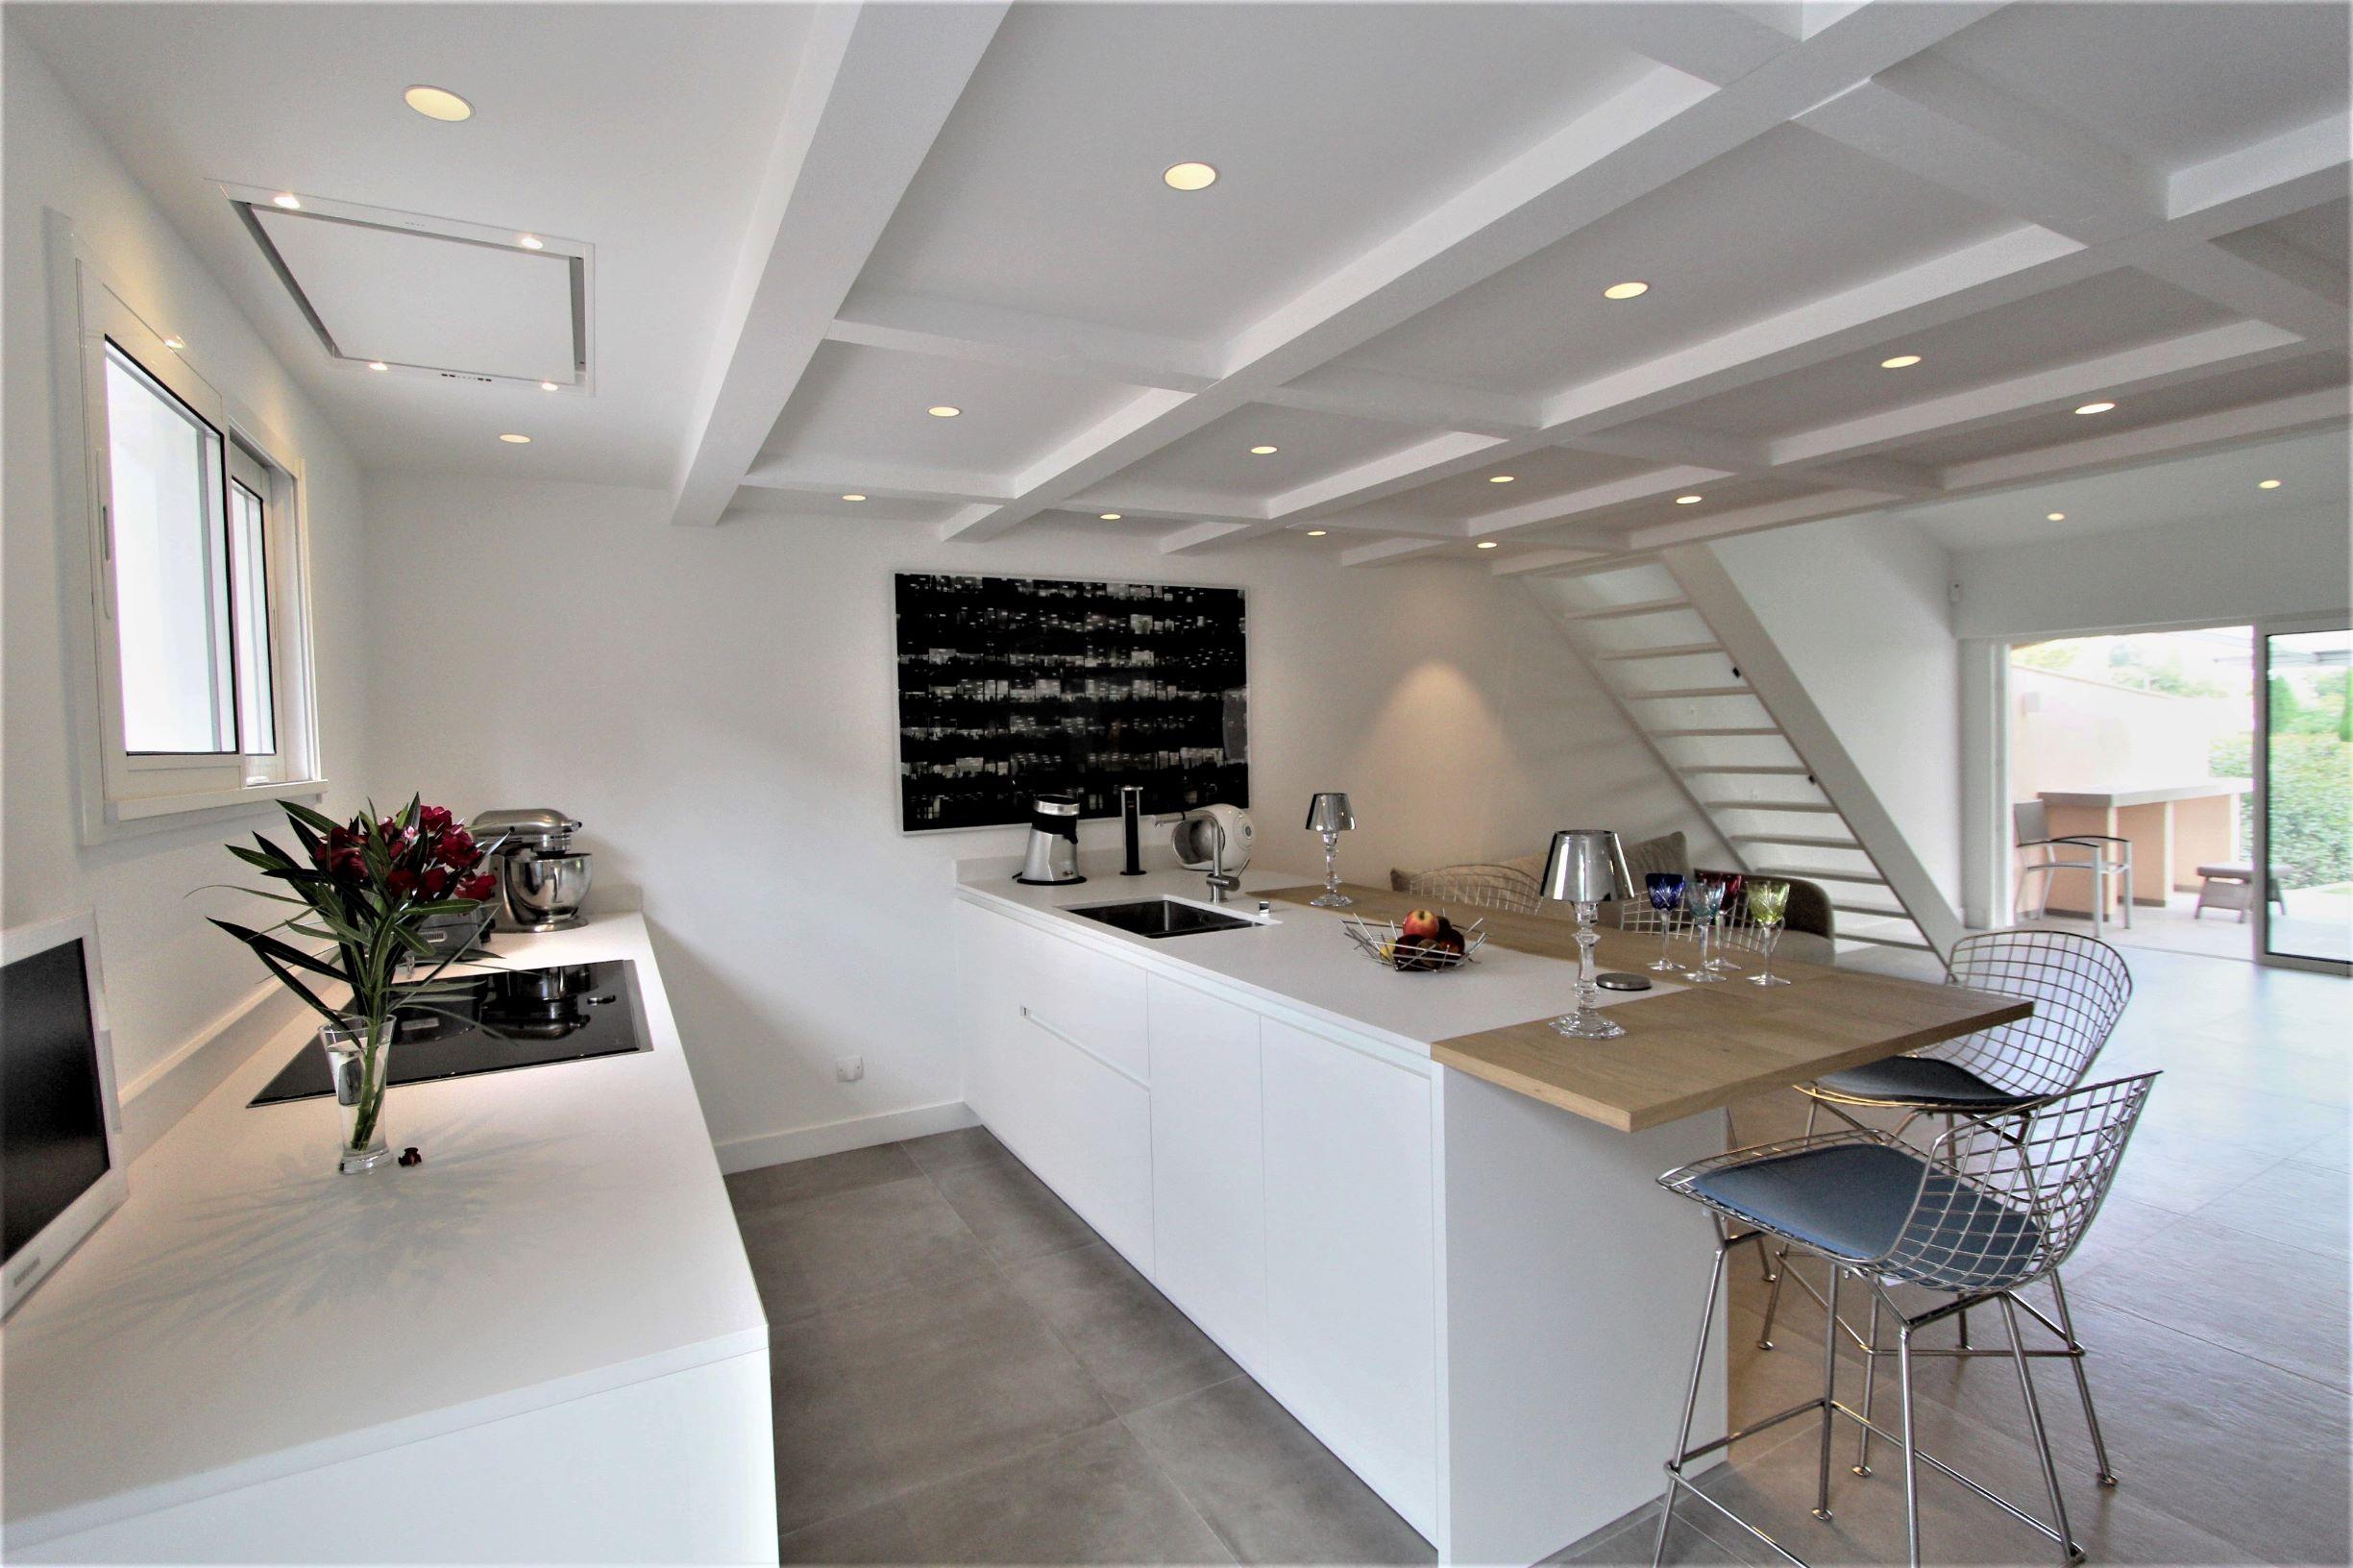 Hotte plafond et plan de travail en Dekton blanc